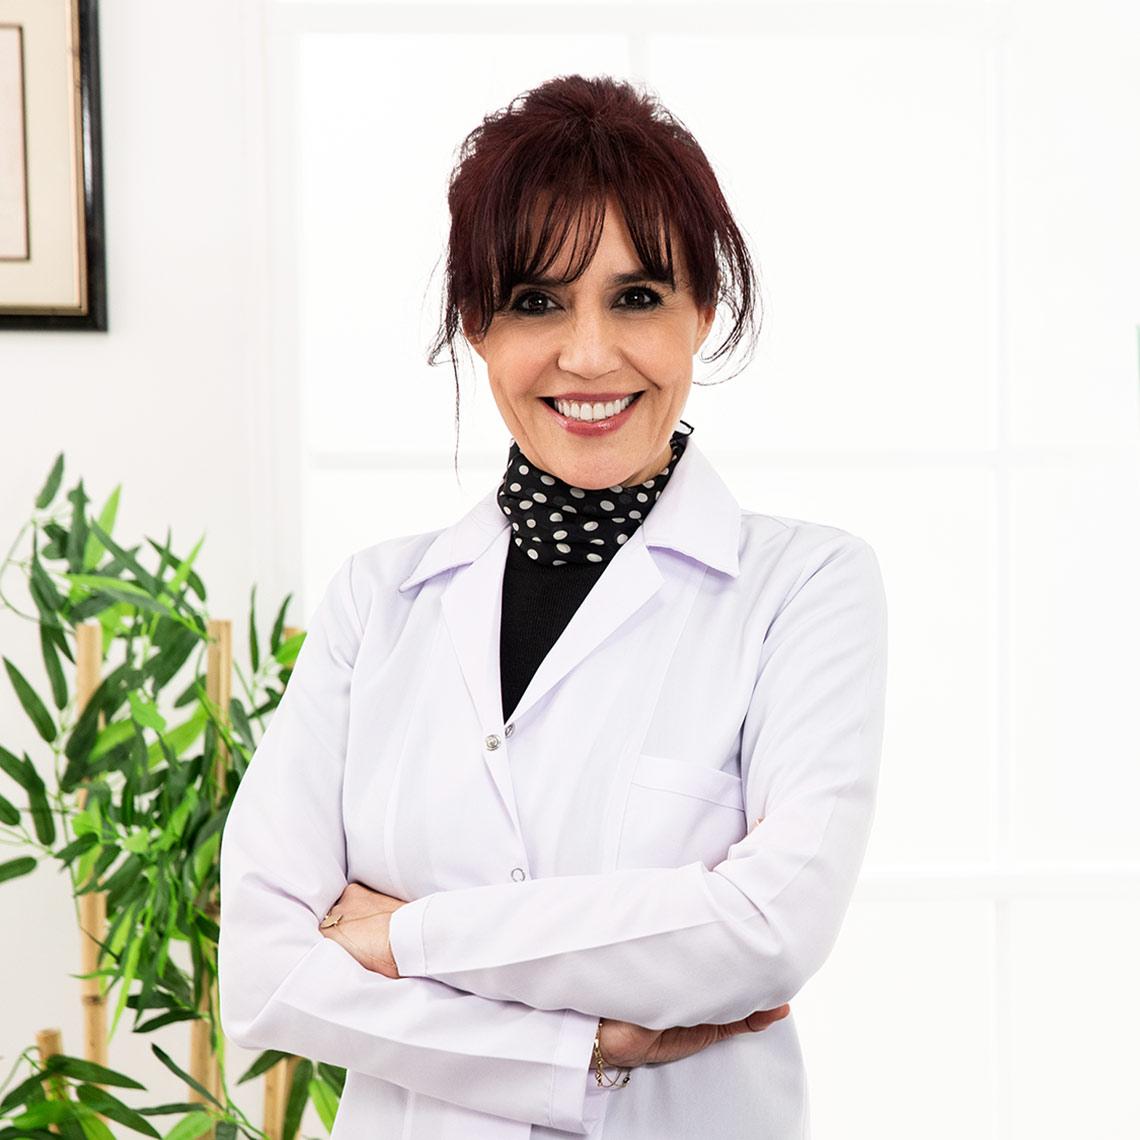 Doç. Dr. Yasemin Oram